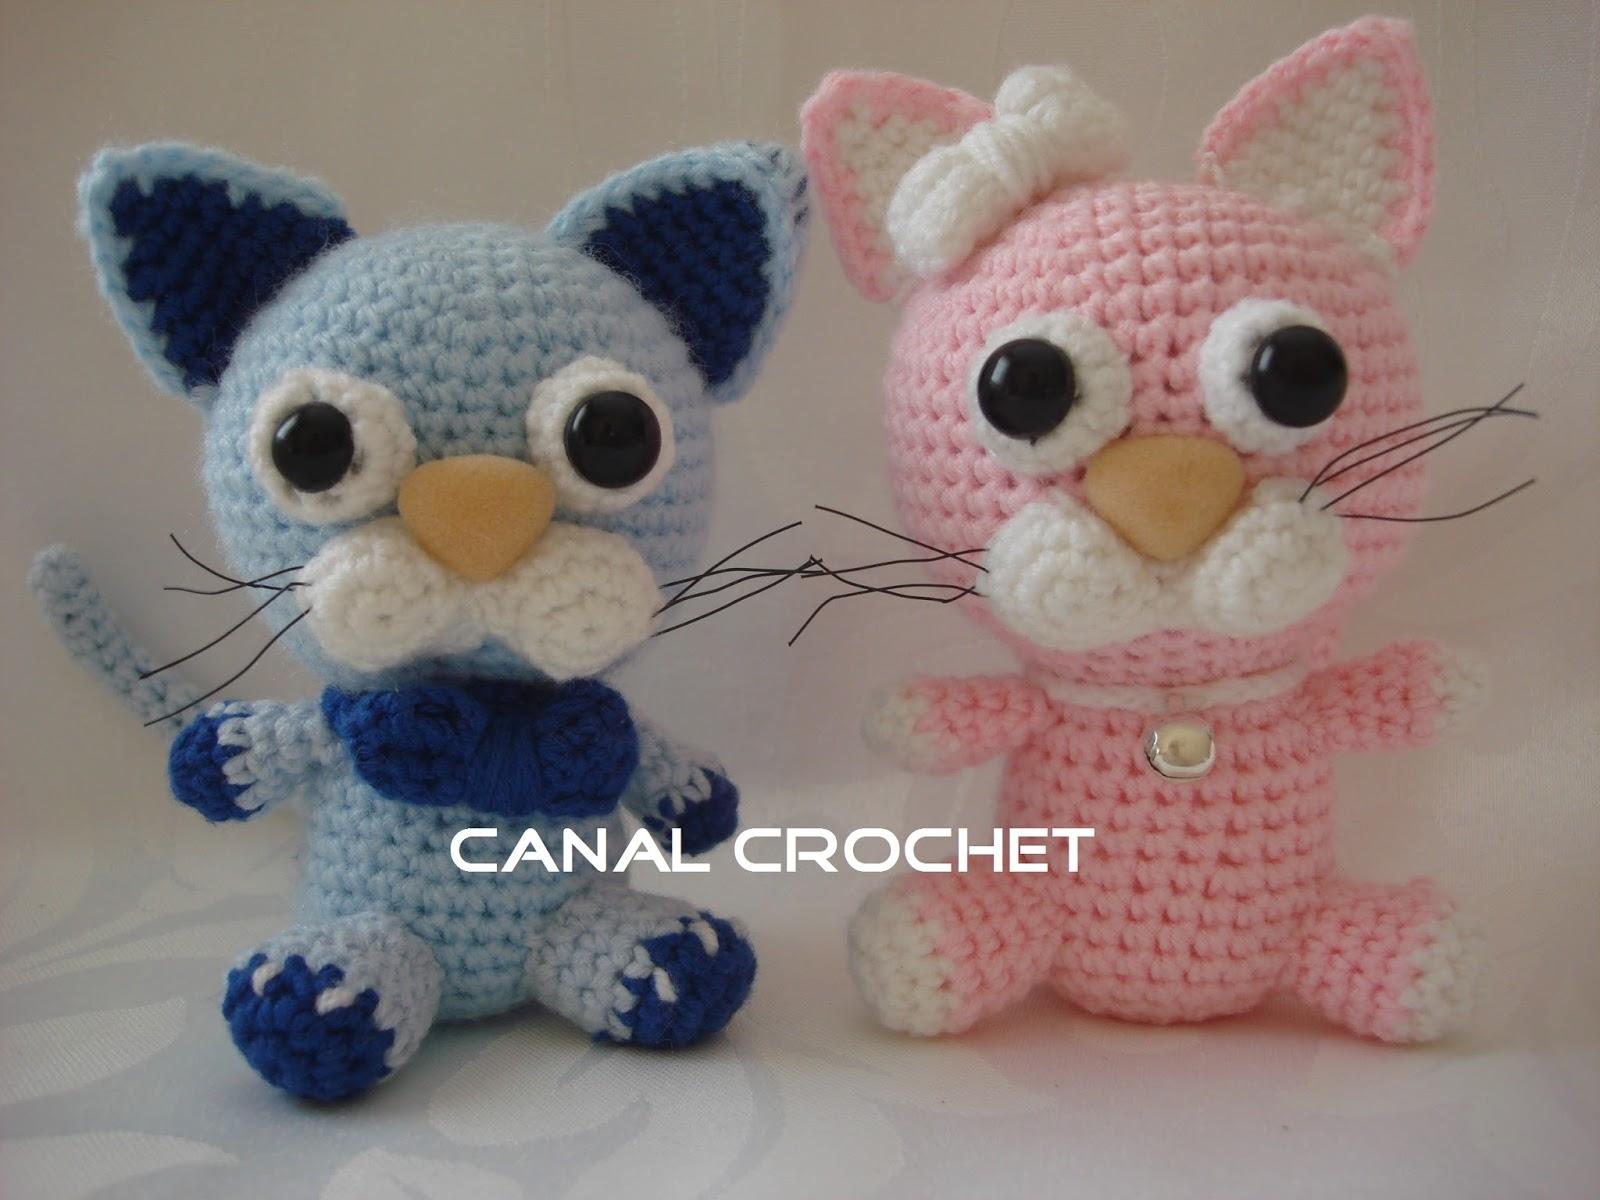 CANAL CROCHET: Gatos amigurumi patron libre